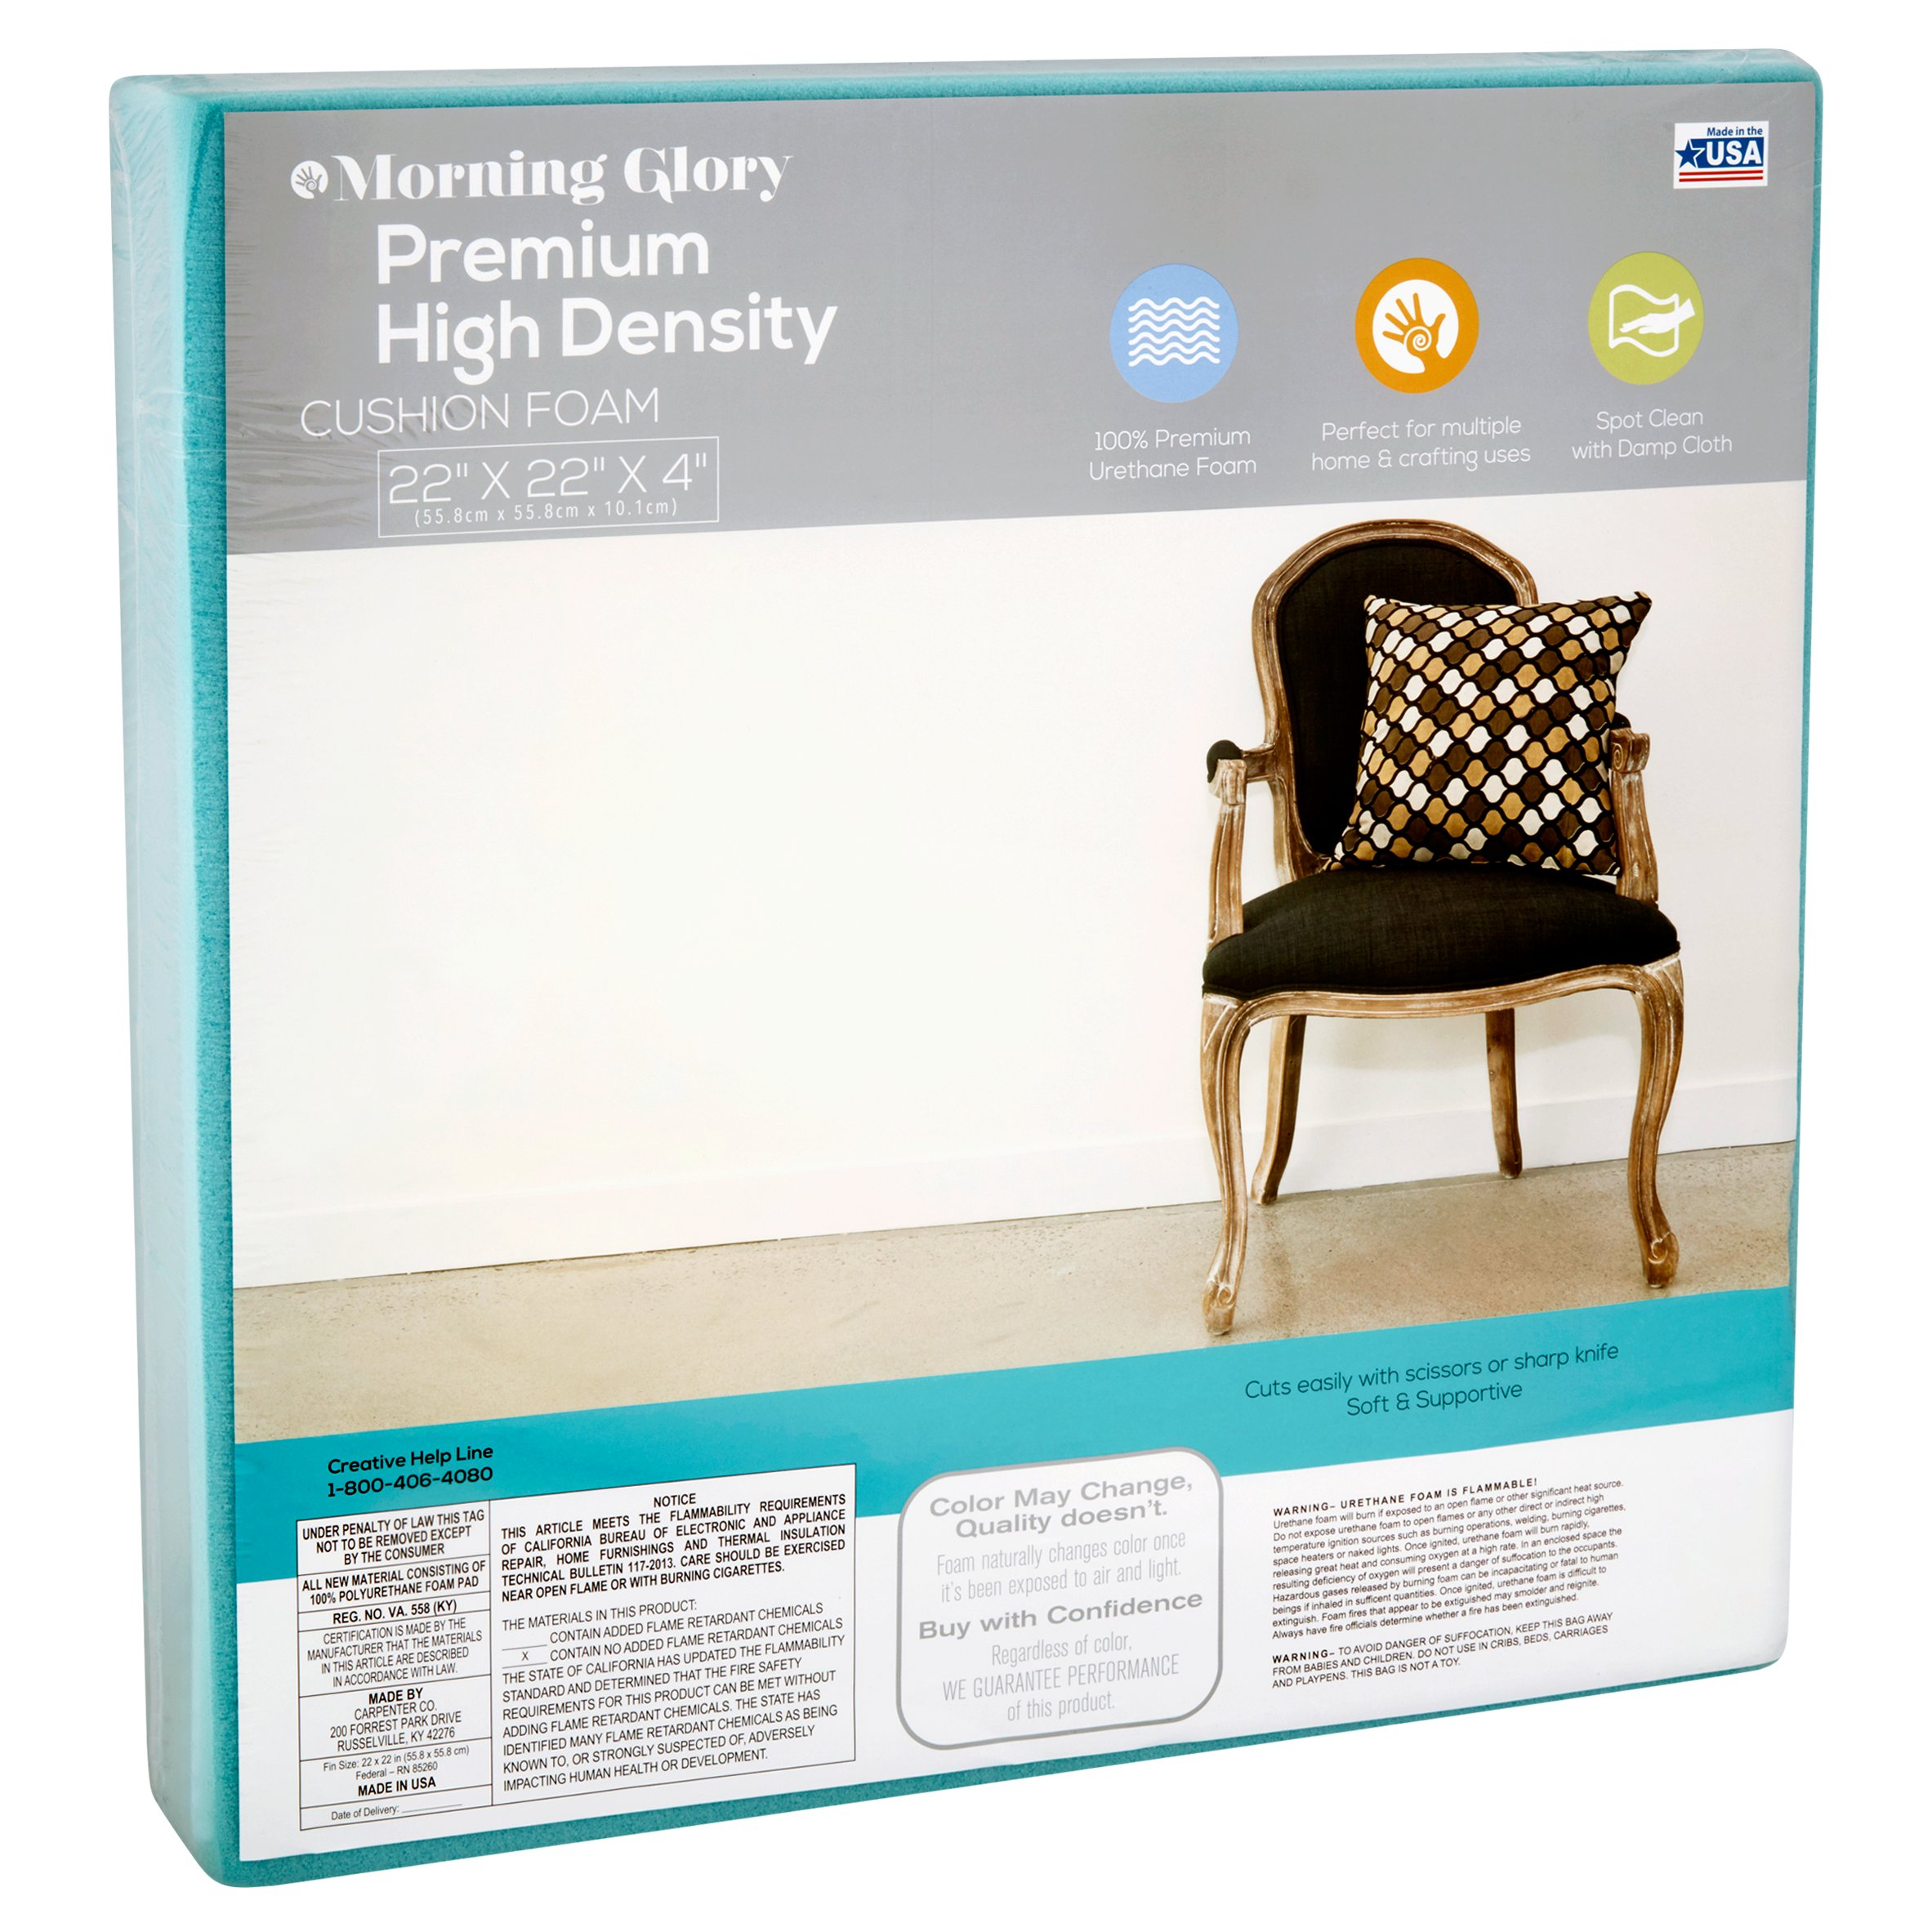 Morning Glory 22 X 22 X 4 Premium High Density Cushion Foam